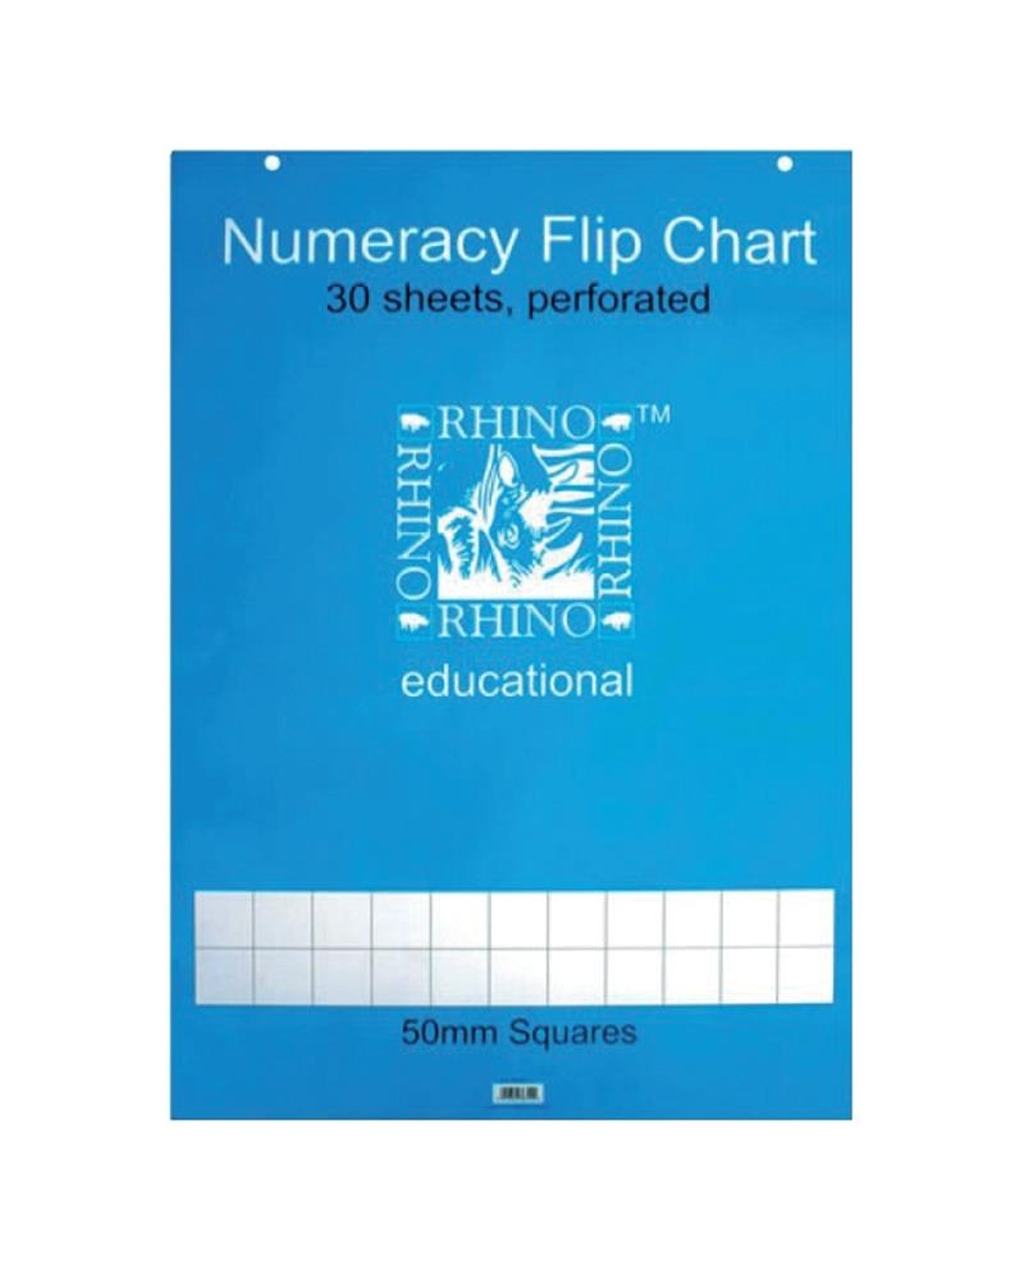 A1 Numeracy Flip Chart